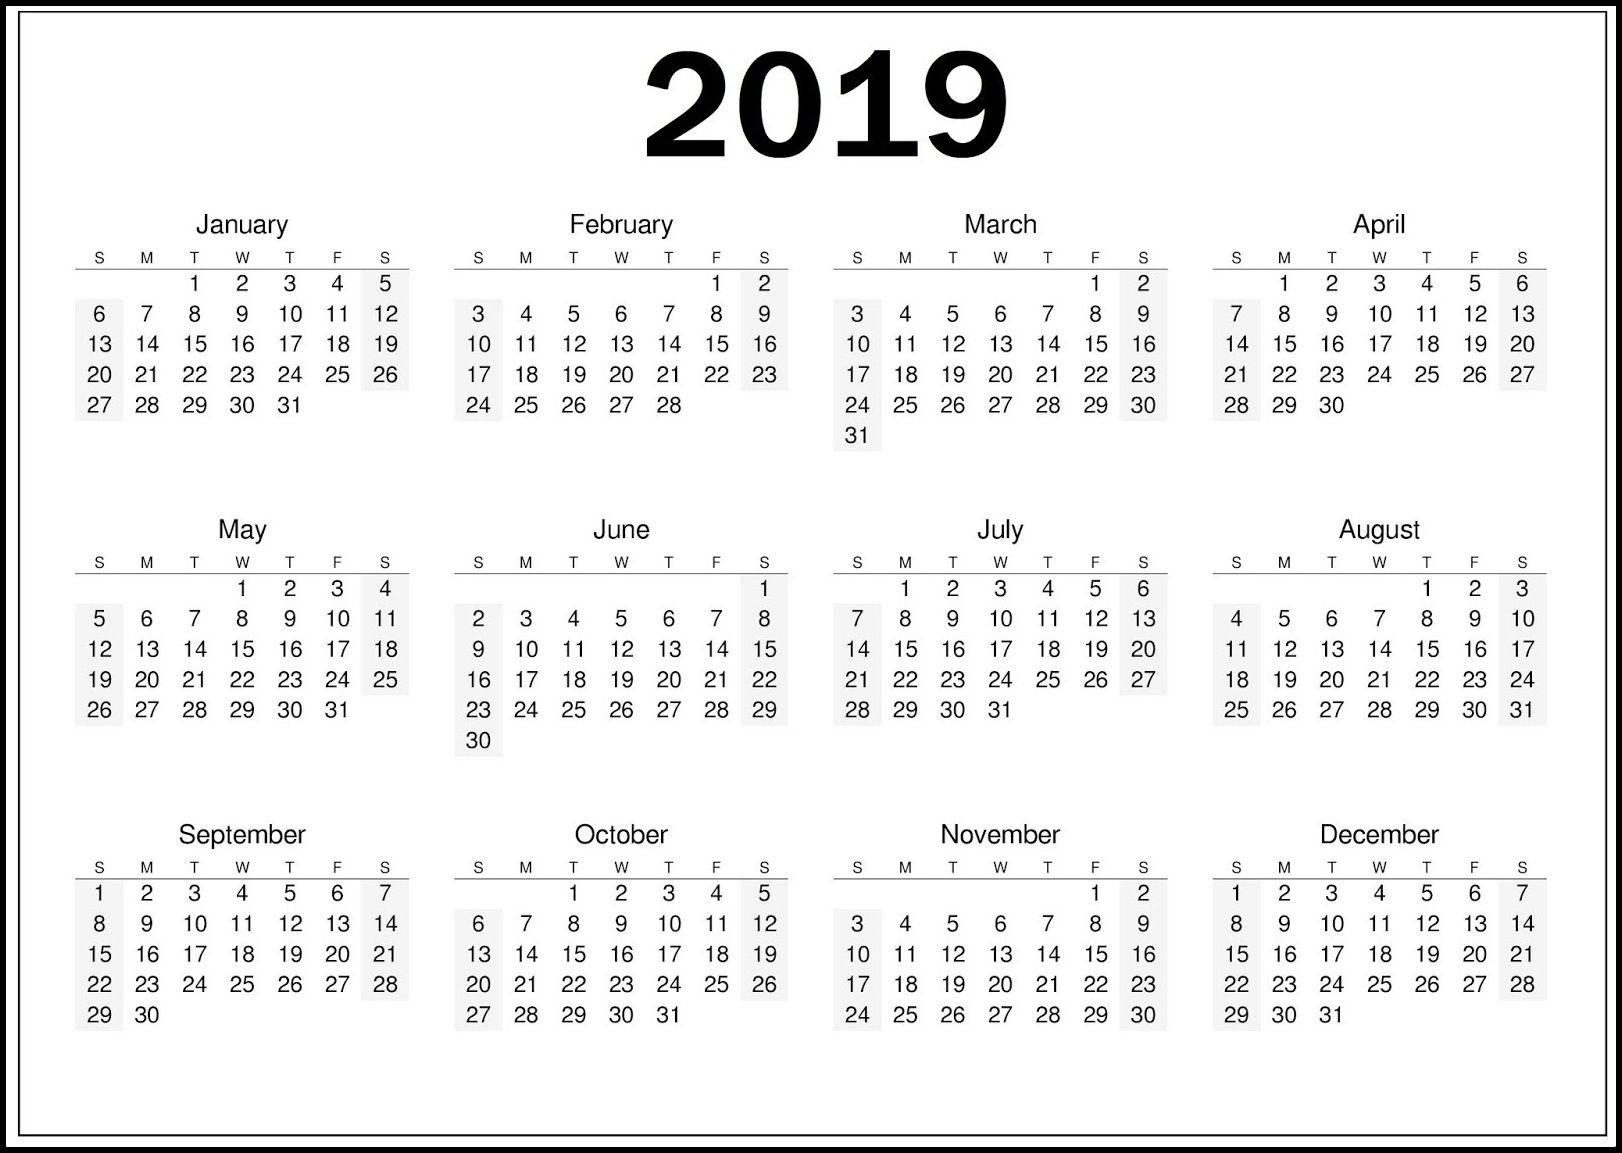 Blank Calendar Template 2019 Download   Top 10 Free 2019 Calendar within 12 Month Calendar Picture Ideas